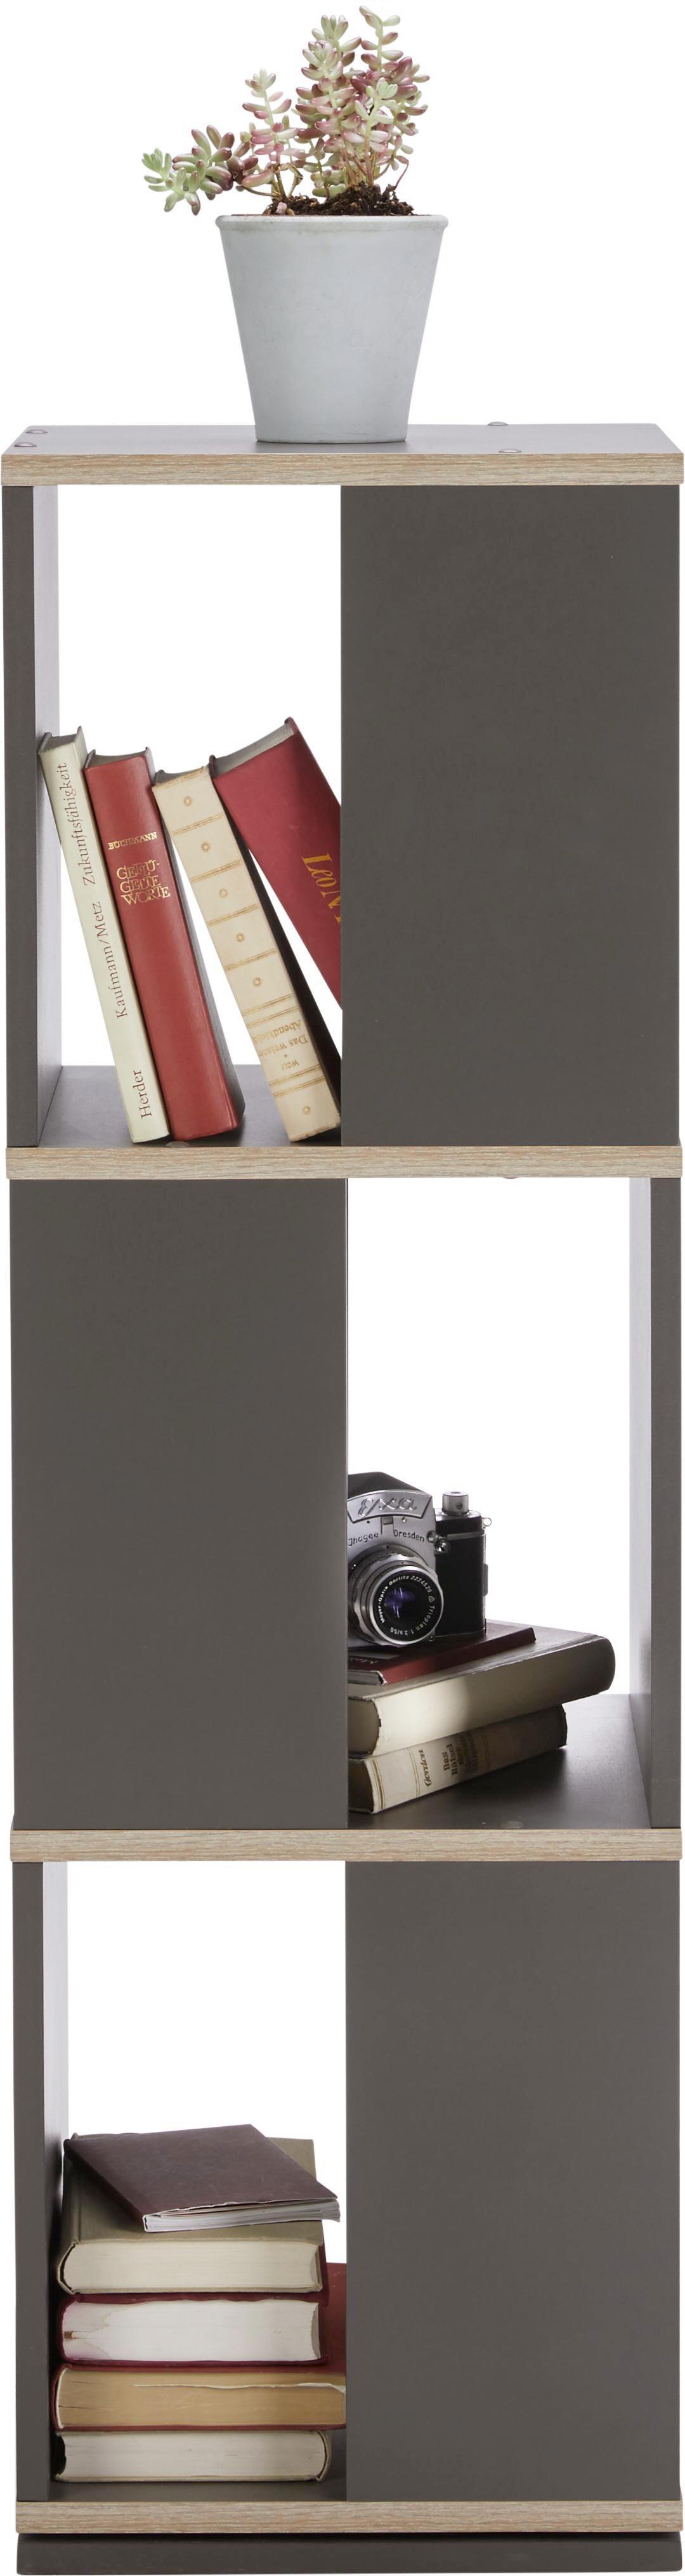 Regal in Grau/eiche - Eichefarben/Grau, MODERN, Holzwerkstoff (34/108/34cm) - MÖMAX modern living